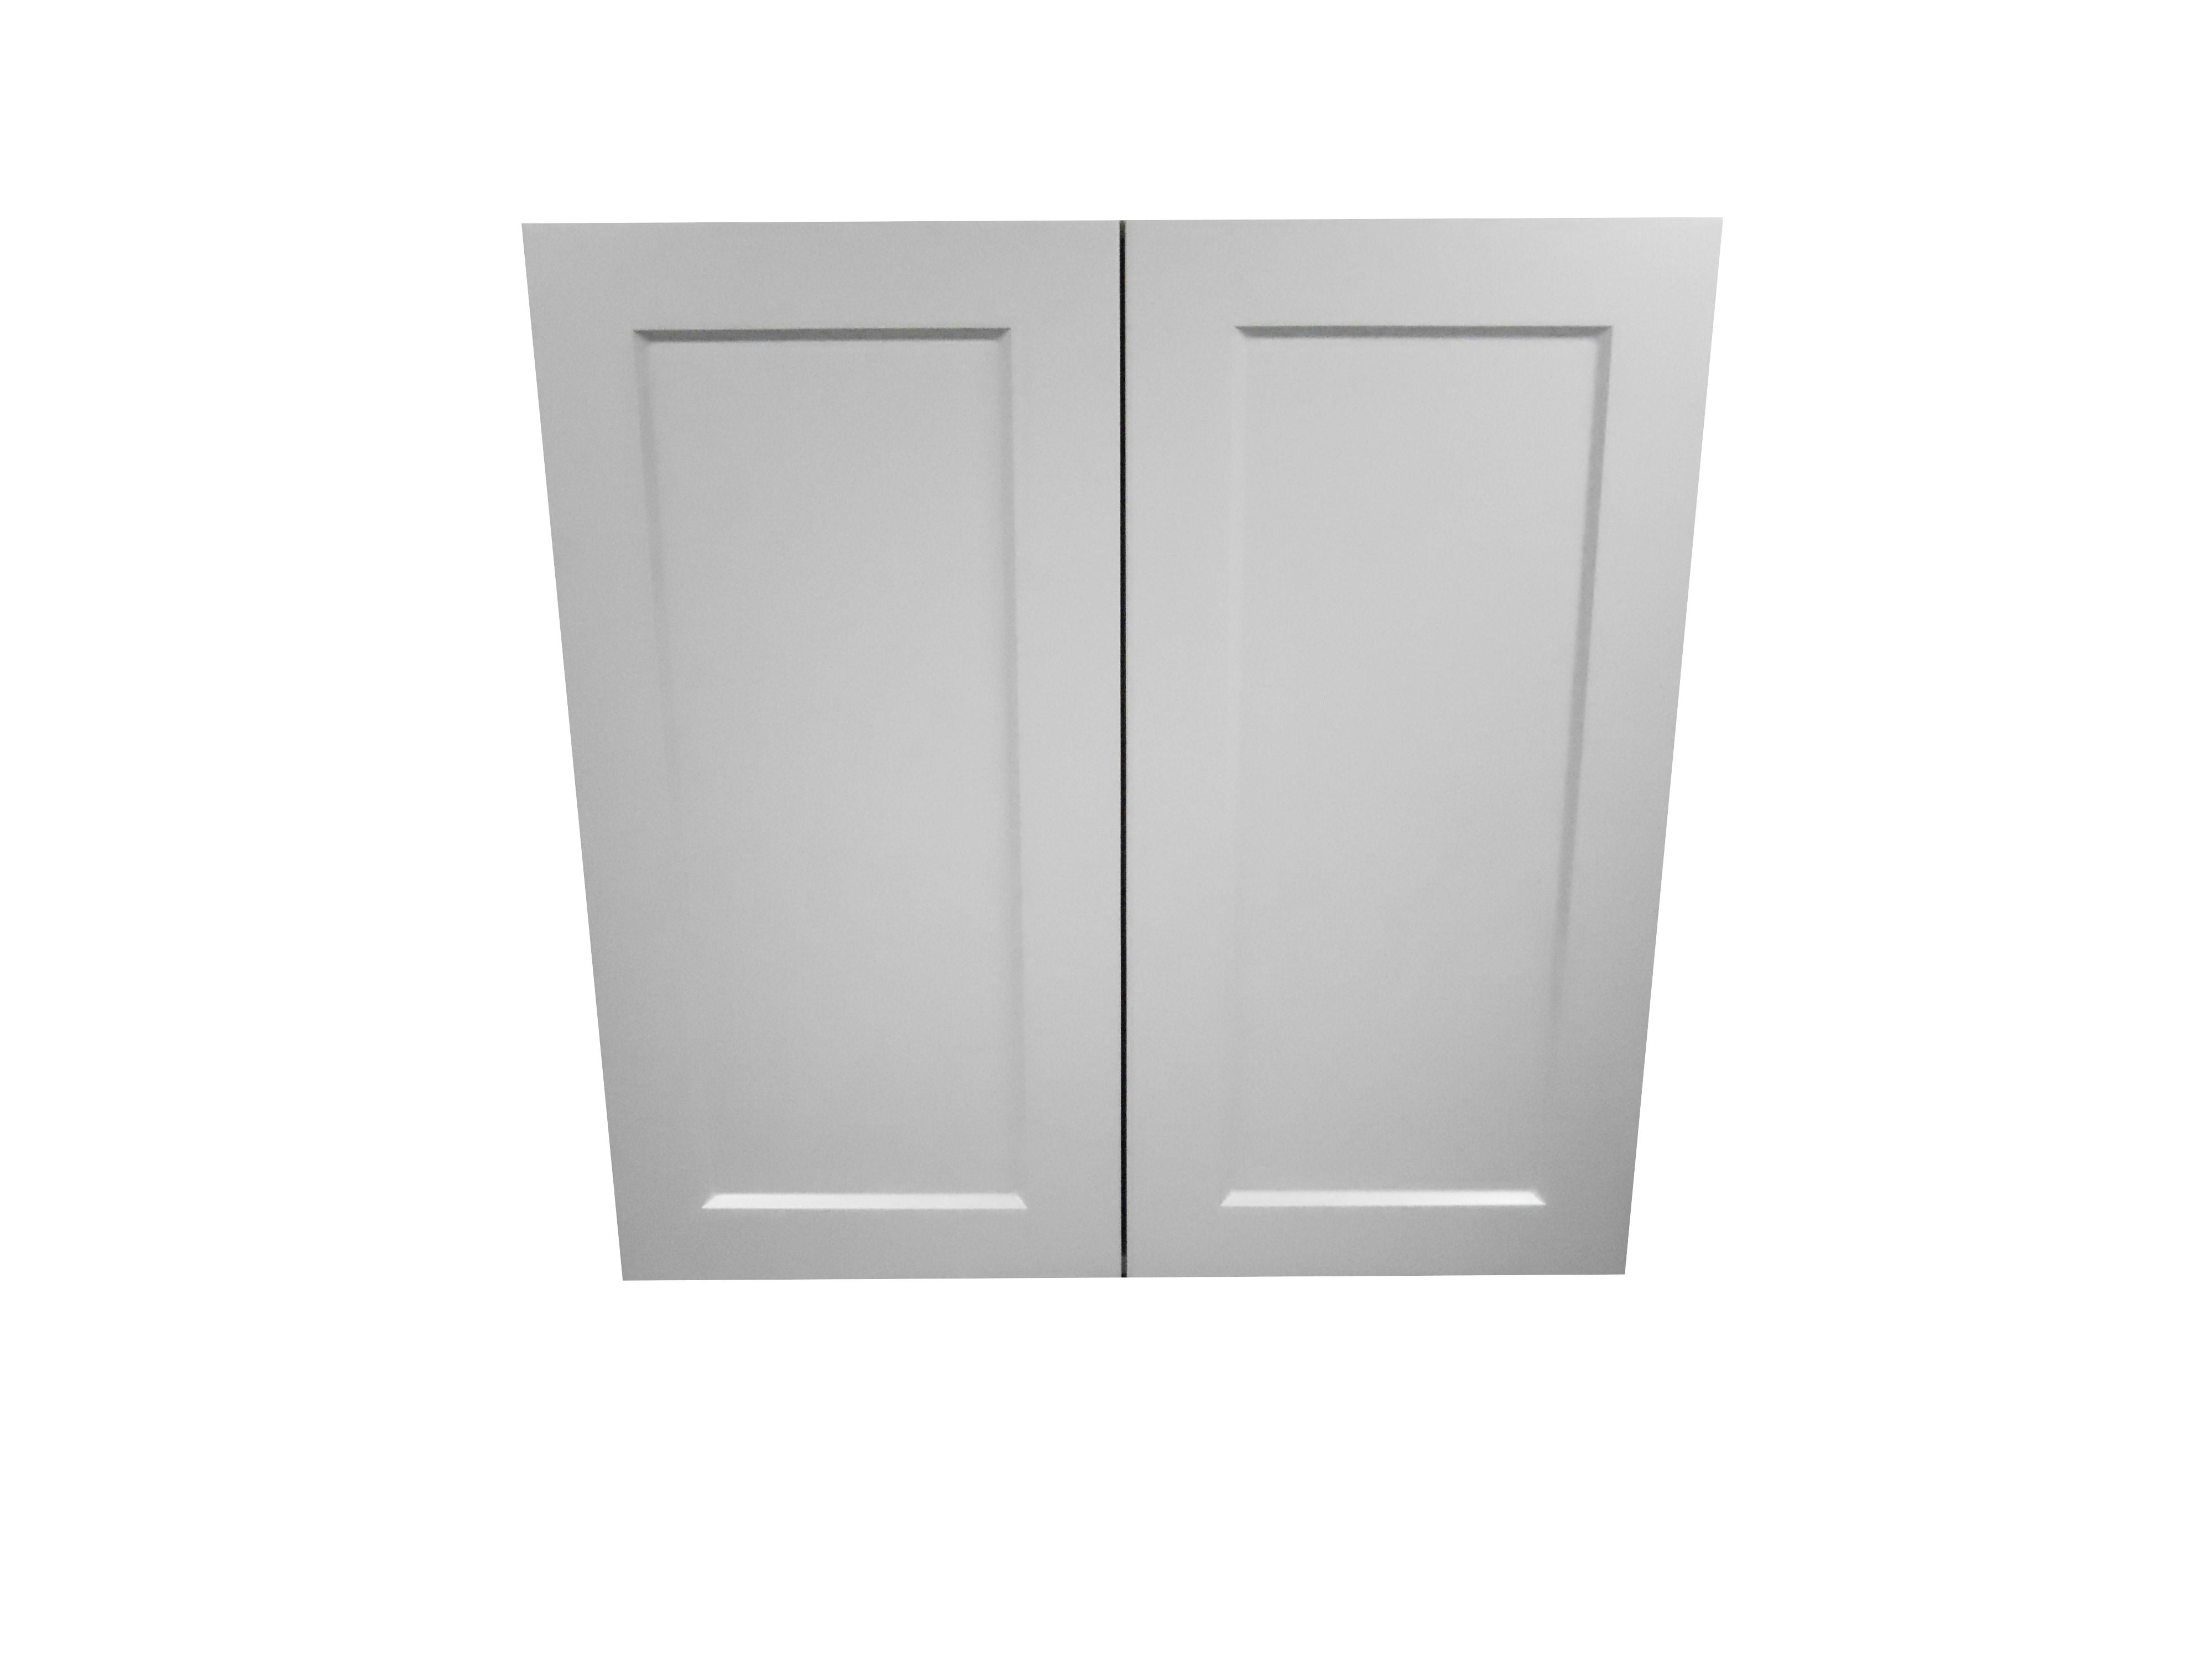 Wall Cabinet with 2 Door / Whistler Grey / Flat Panel Grey / 30x30 Whistler Grey 0